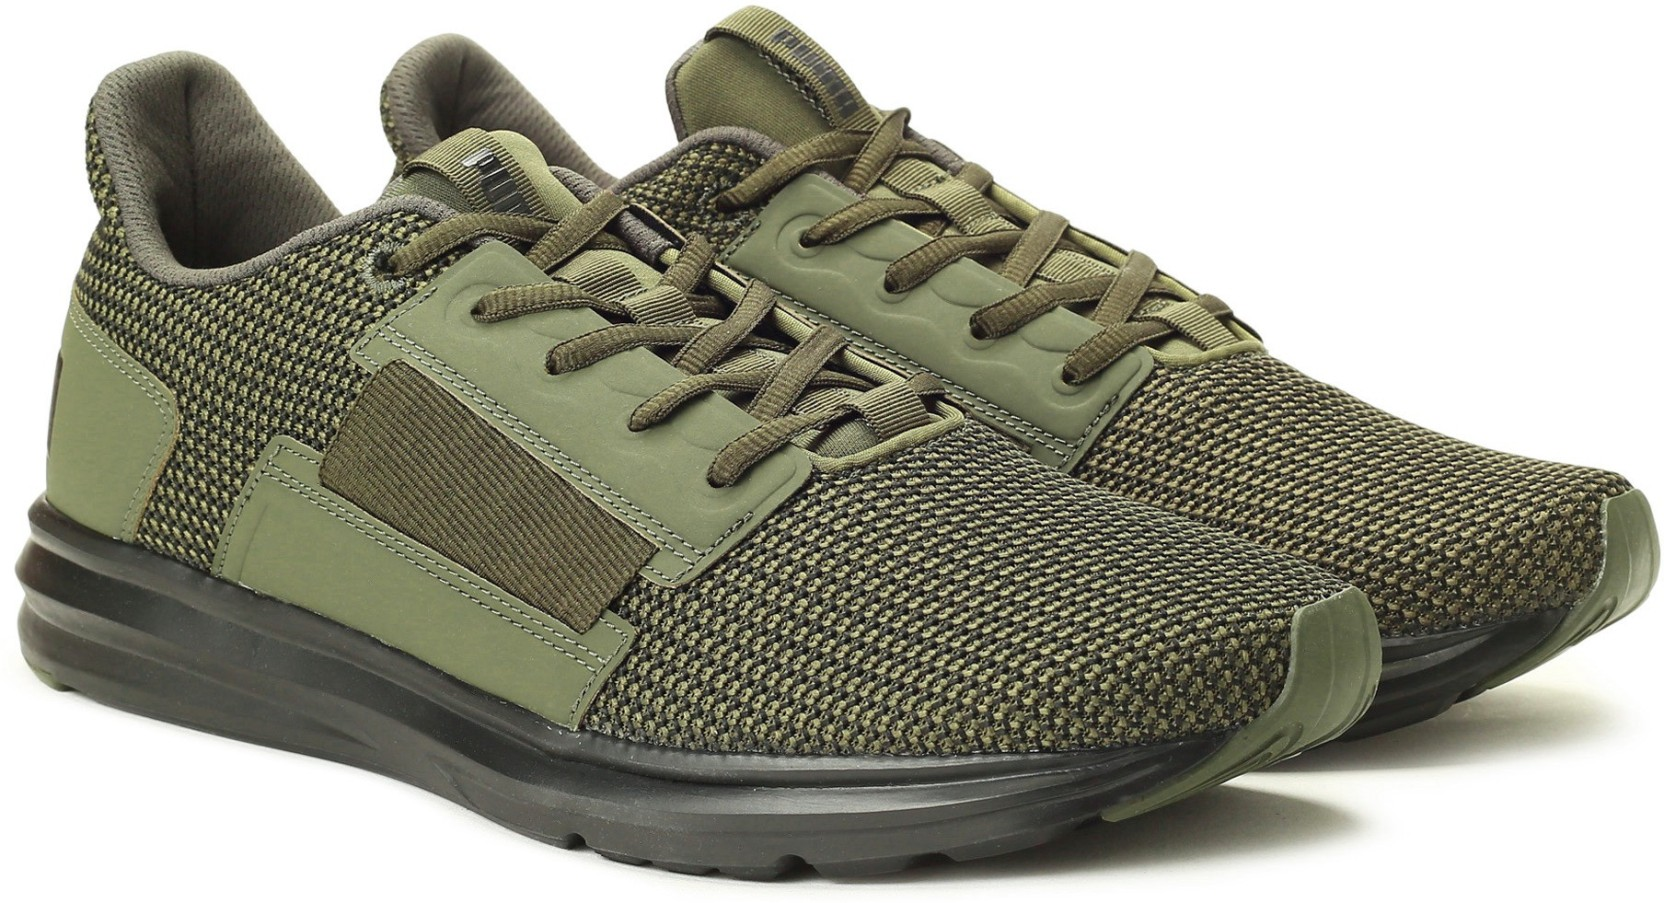 Puma Enzo Street Knit IDP Running Shoes For Men - Buy Forest Night ... 7f682bdb854